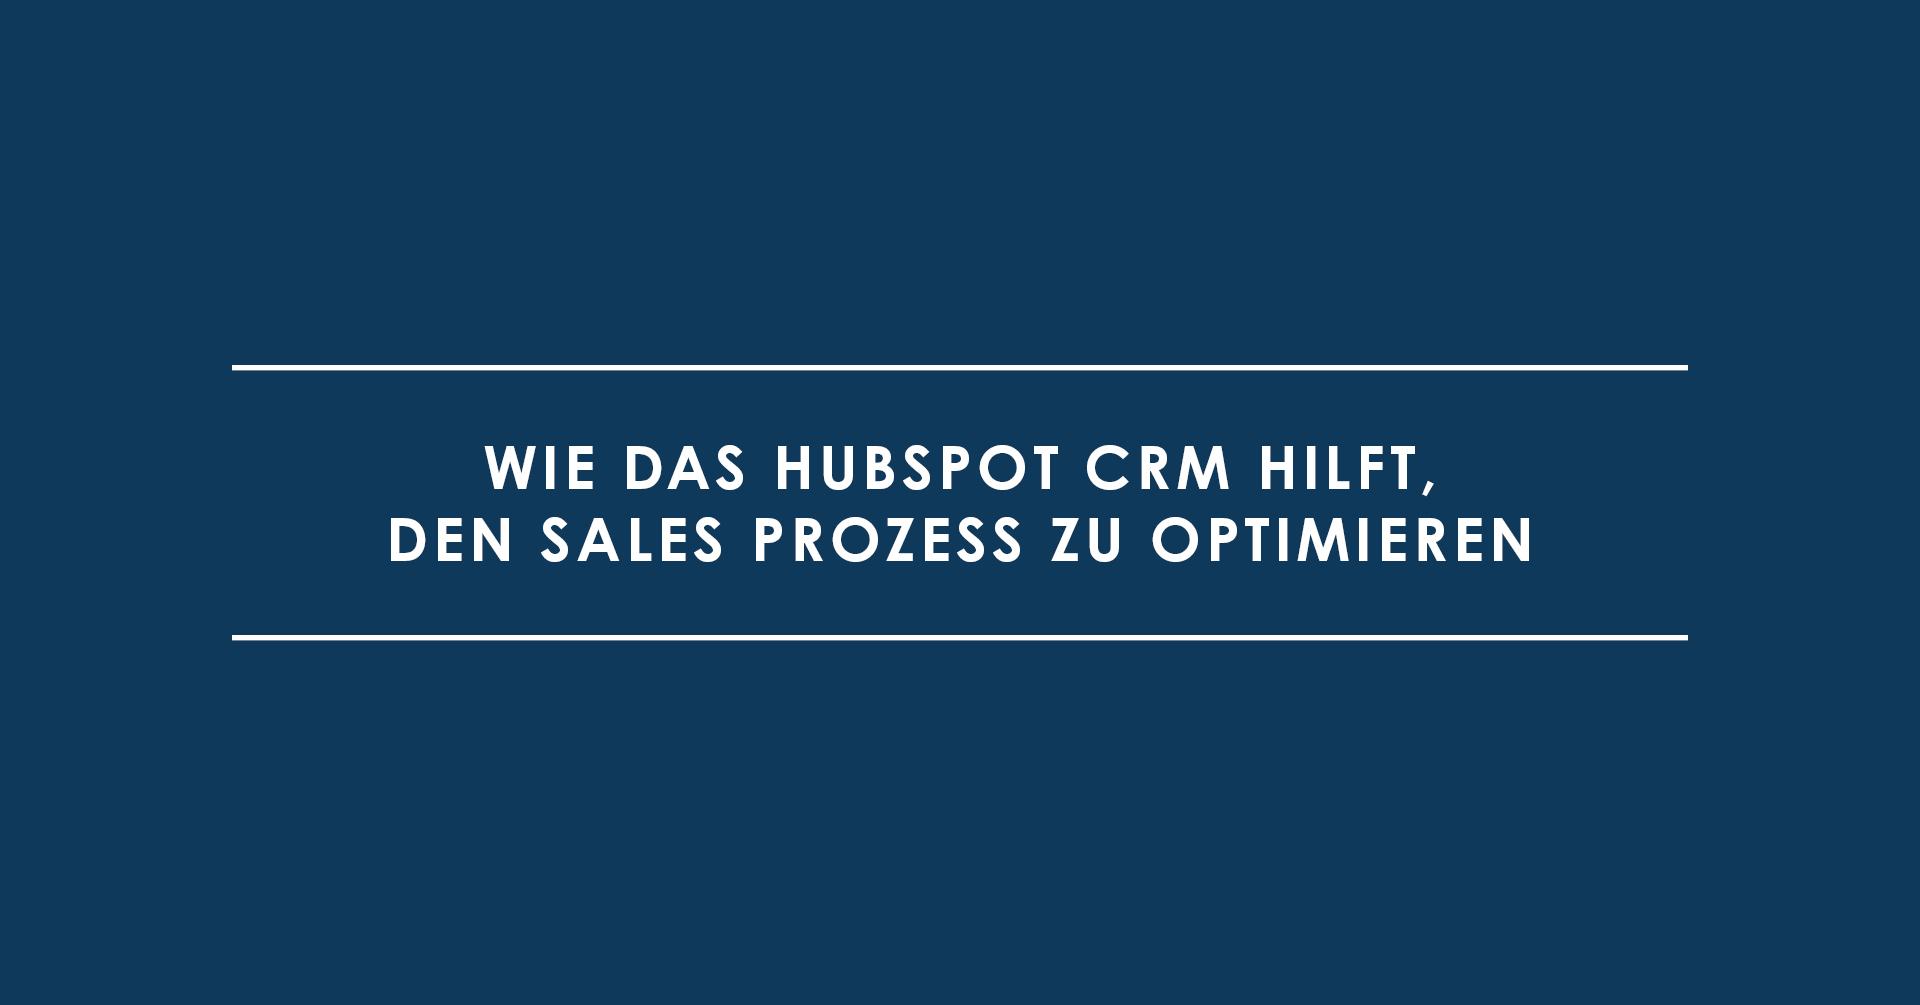 Wie das HubSpot CRM hilft, den Sales Prozess zu optimieren